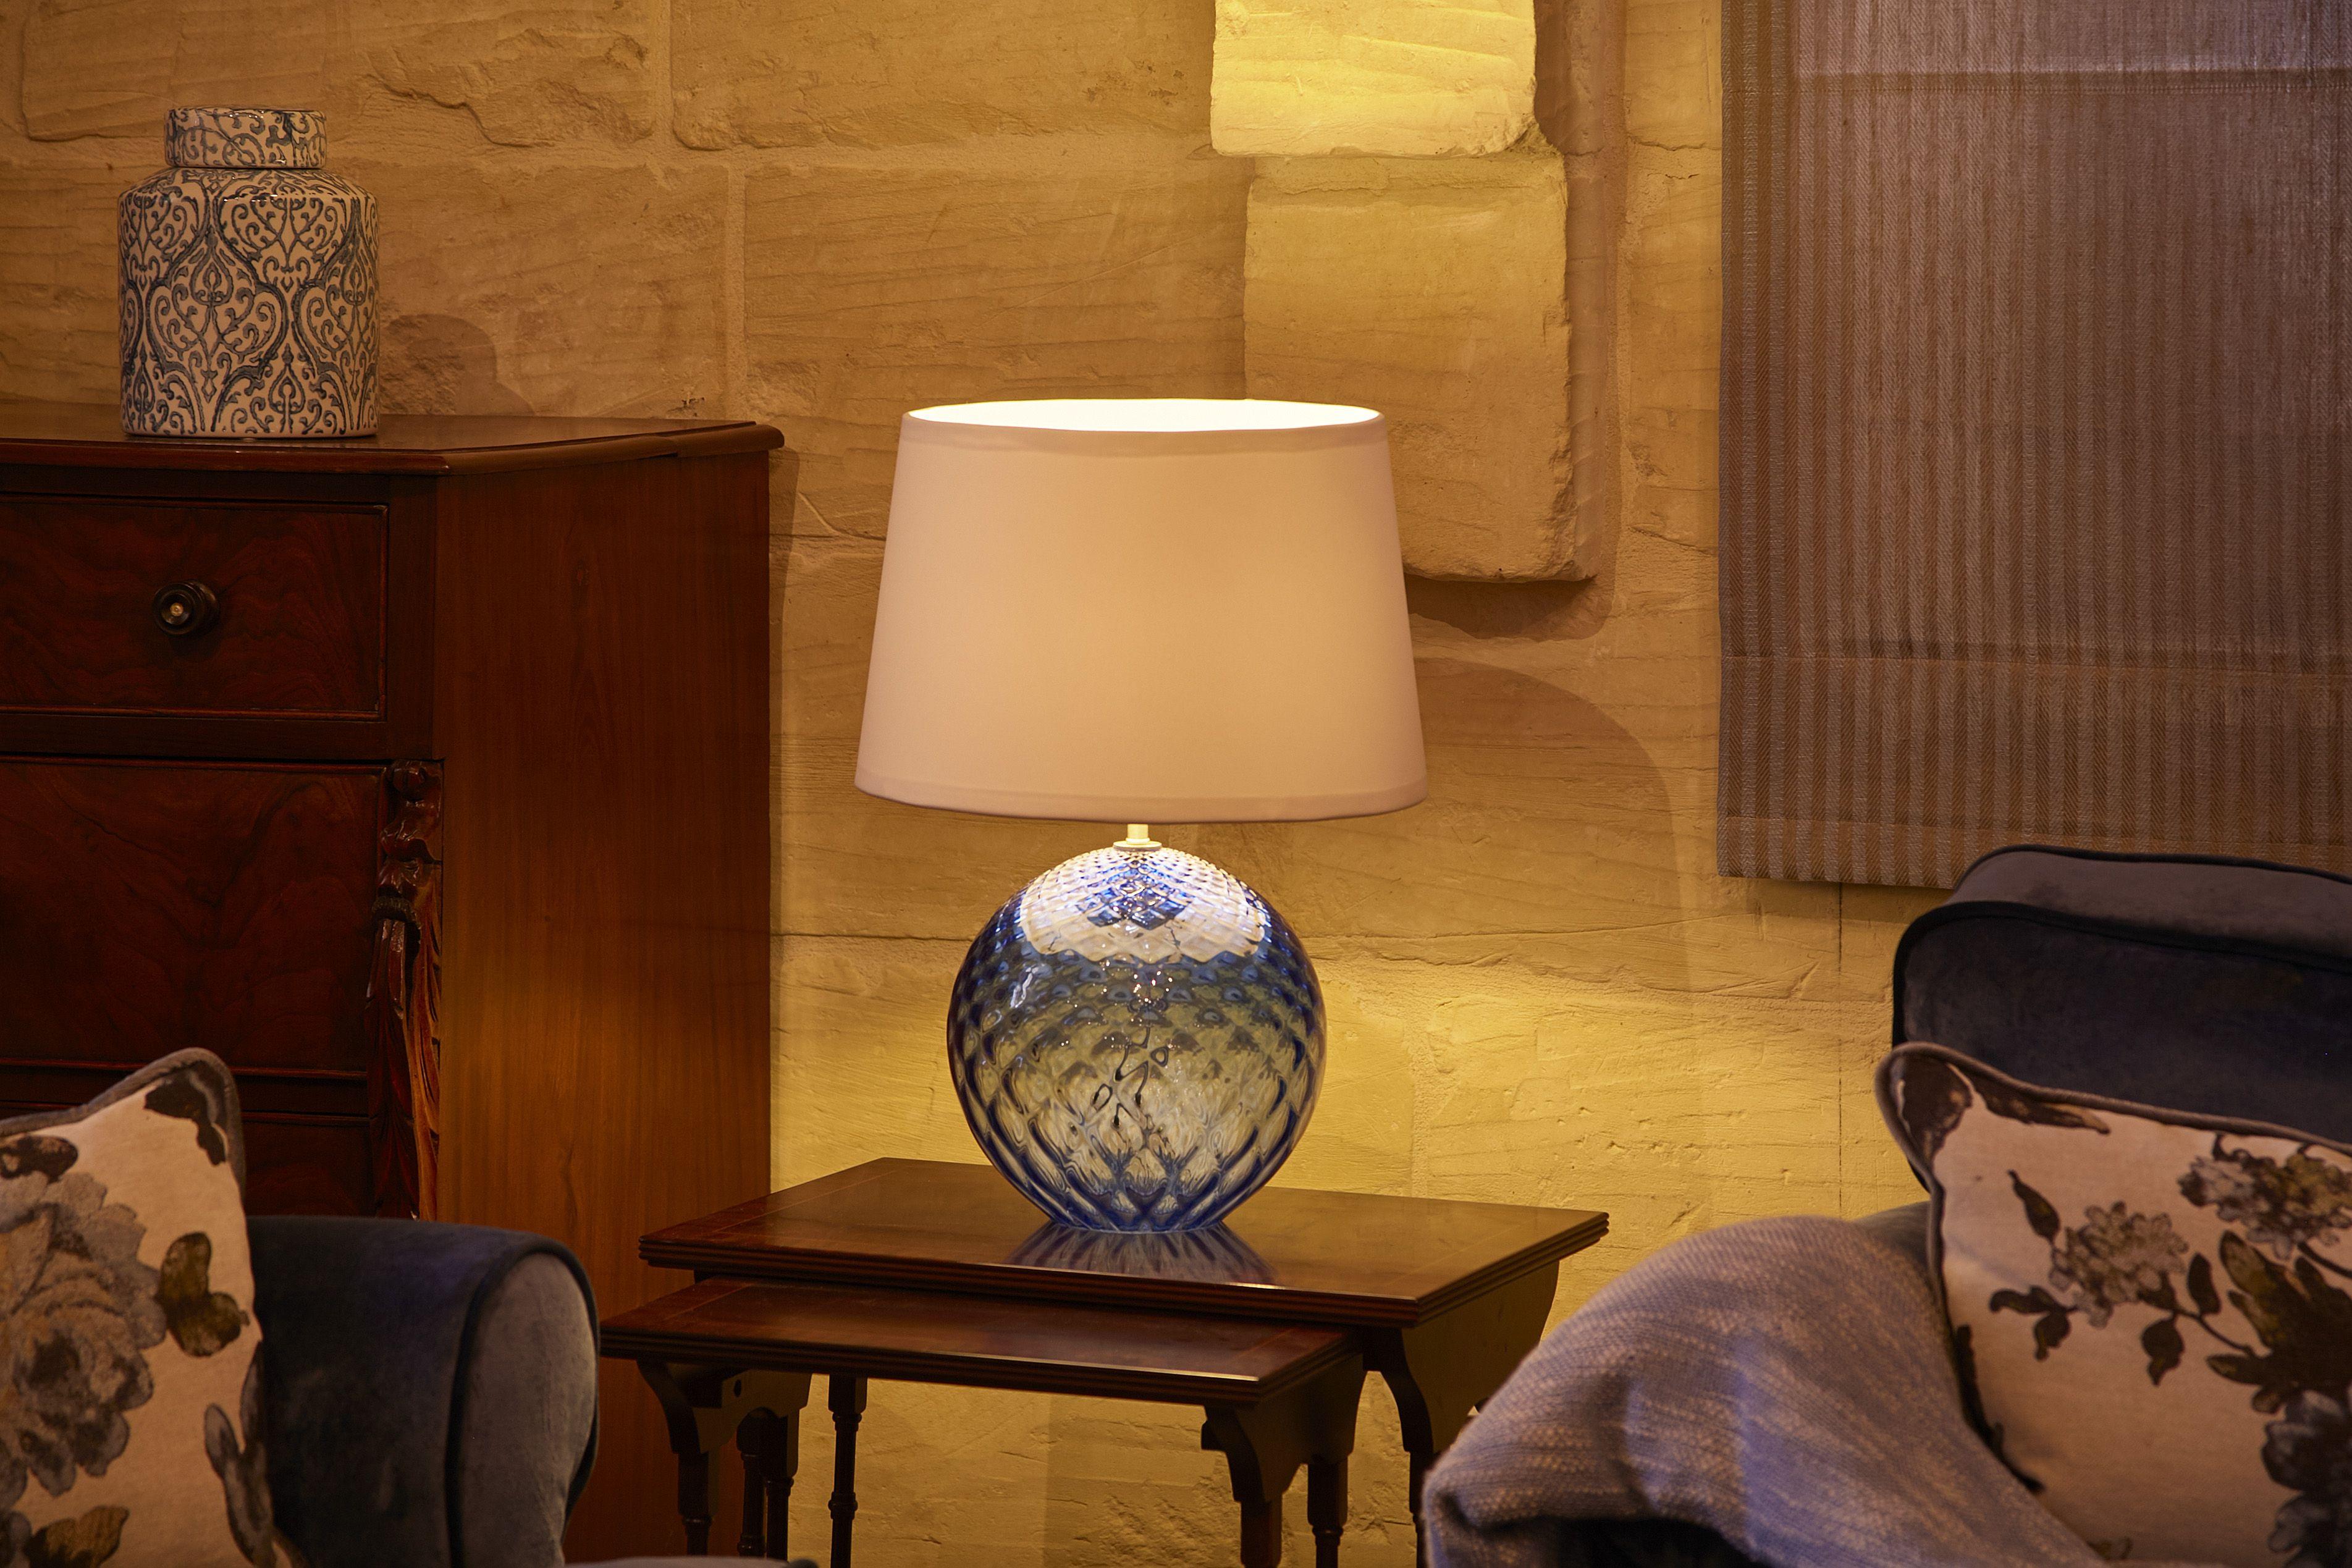 Handmade table lamps by mdina glass available in a range of colours handmade table lamps by mdina glass available in a range of colours shapes sizes aloadofball Choice Image